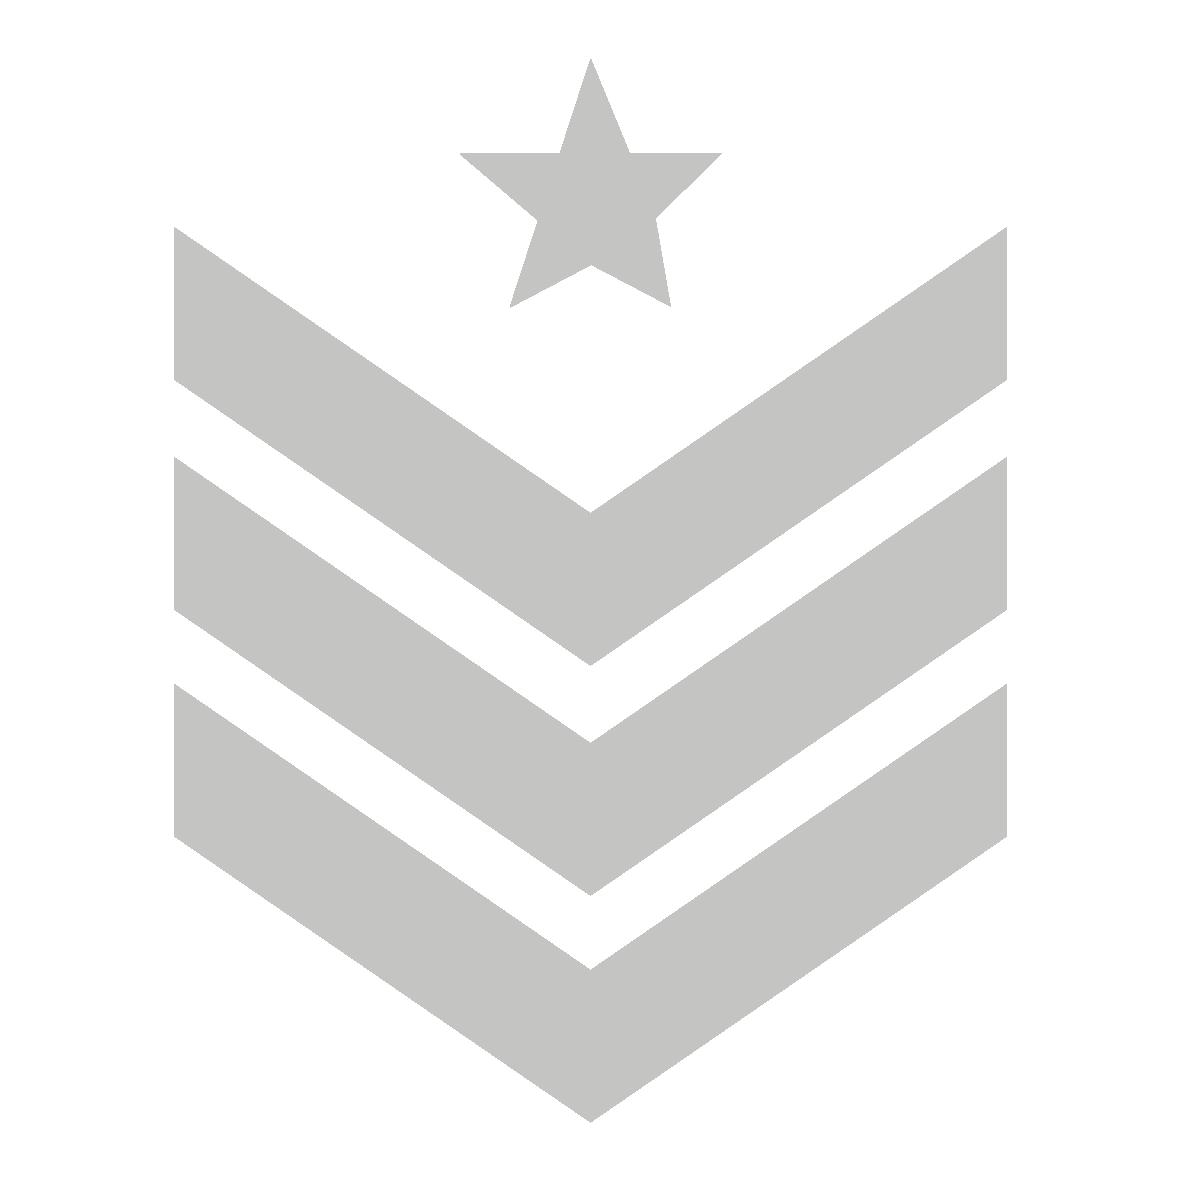 mil_privilege_logo_footer.png